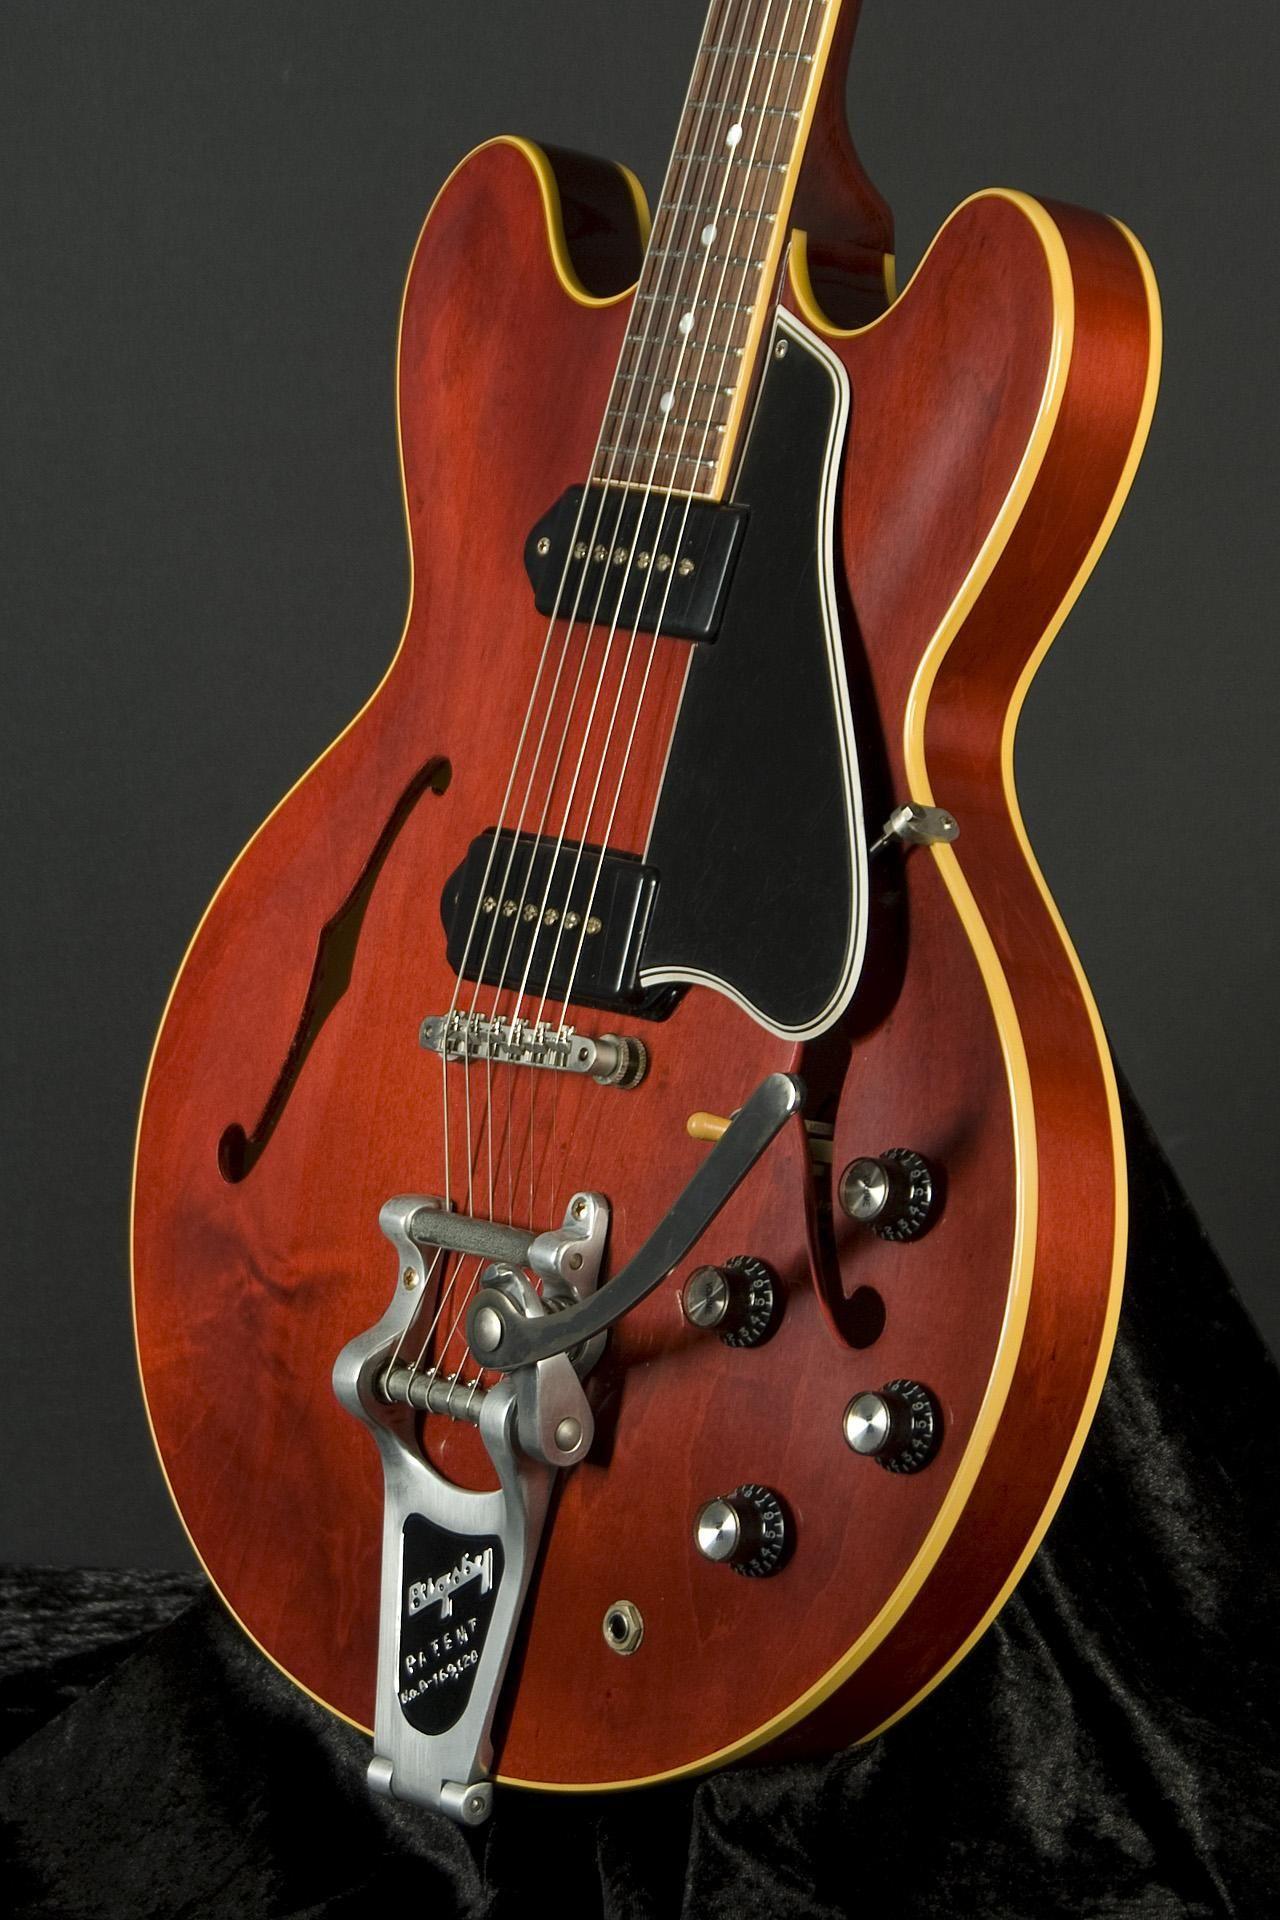 Gibson Les Paul Custom Semi Hollow Honda Trail 70 Wiring Diagram Es 330 Vos Bigsby Antique Red